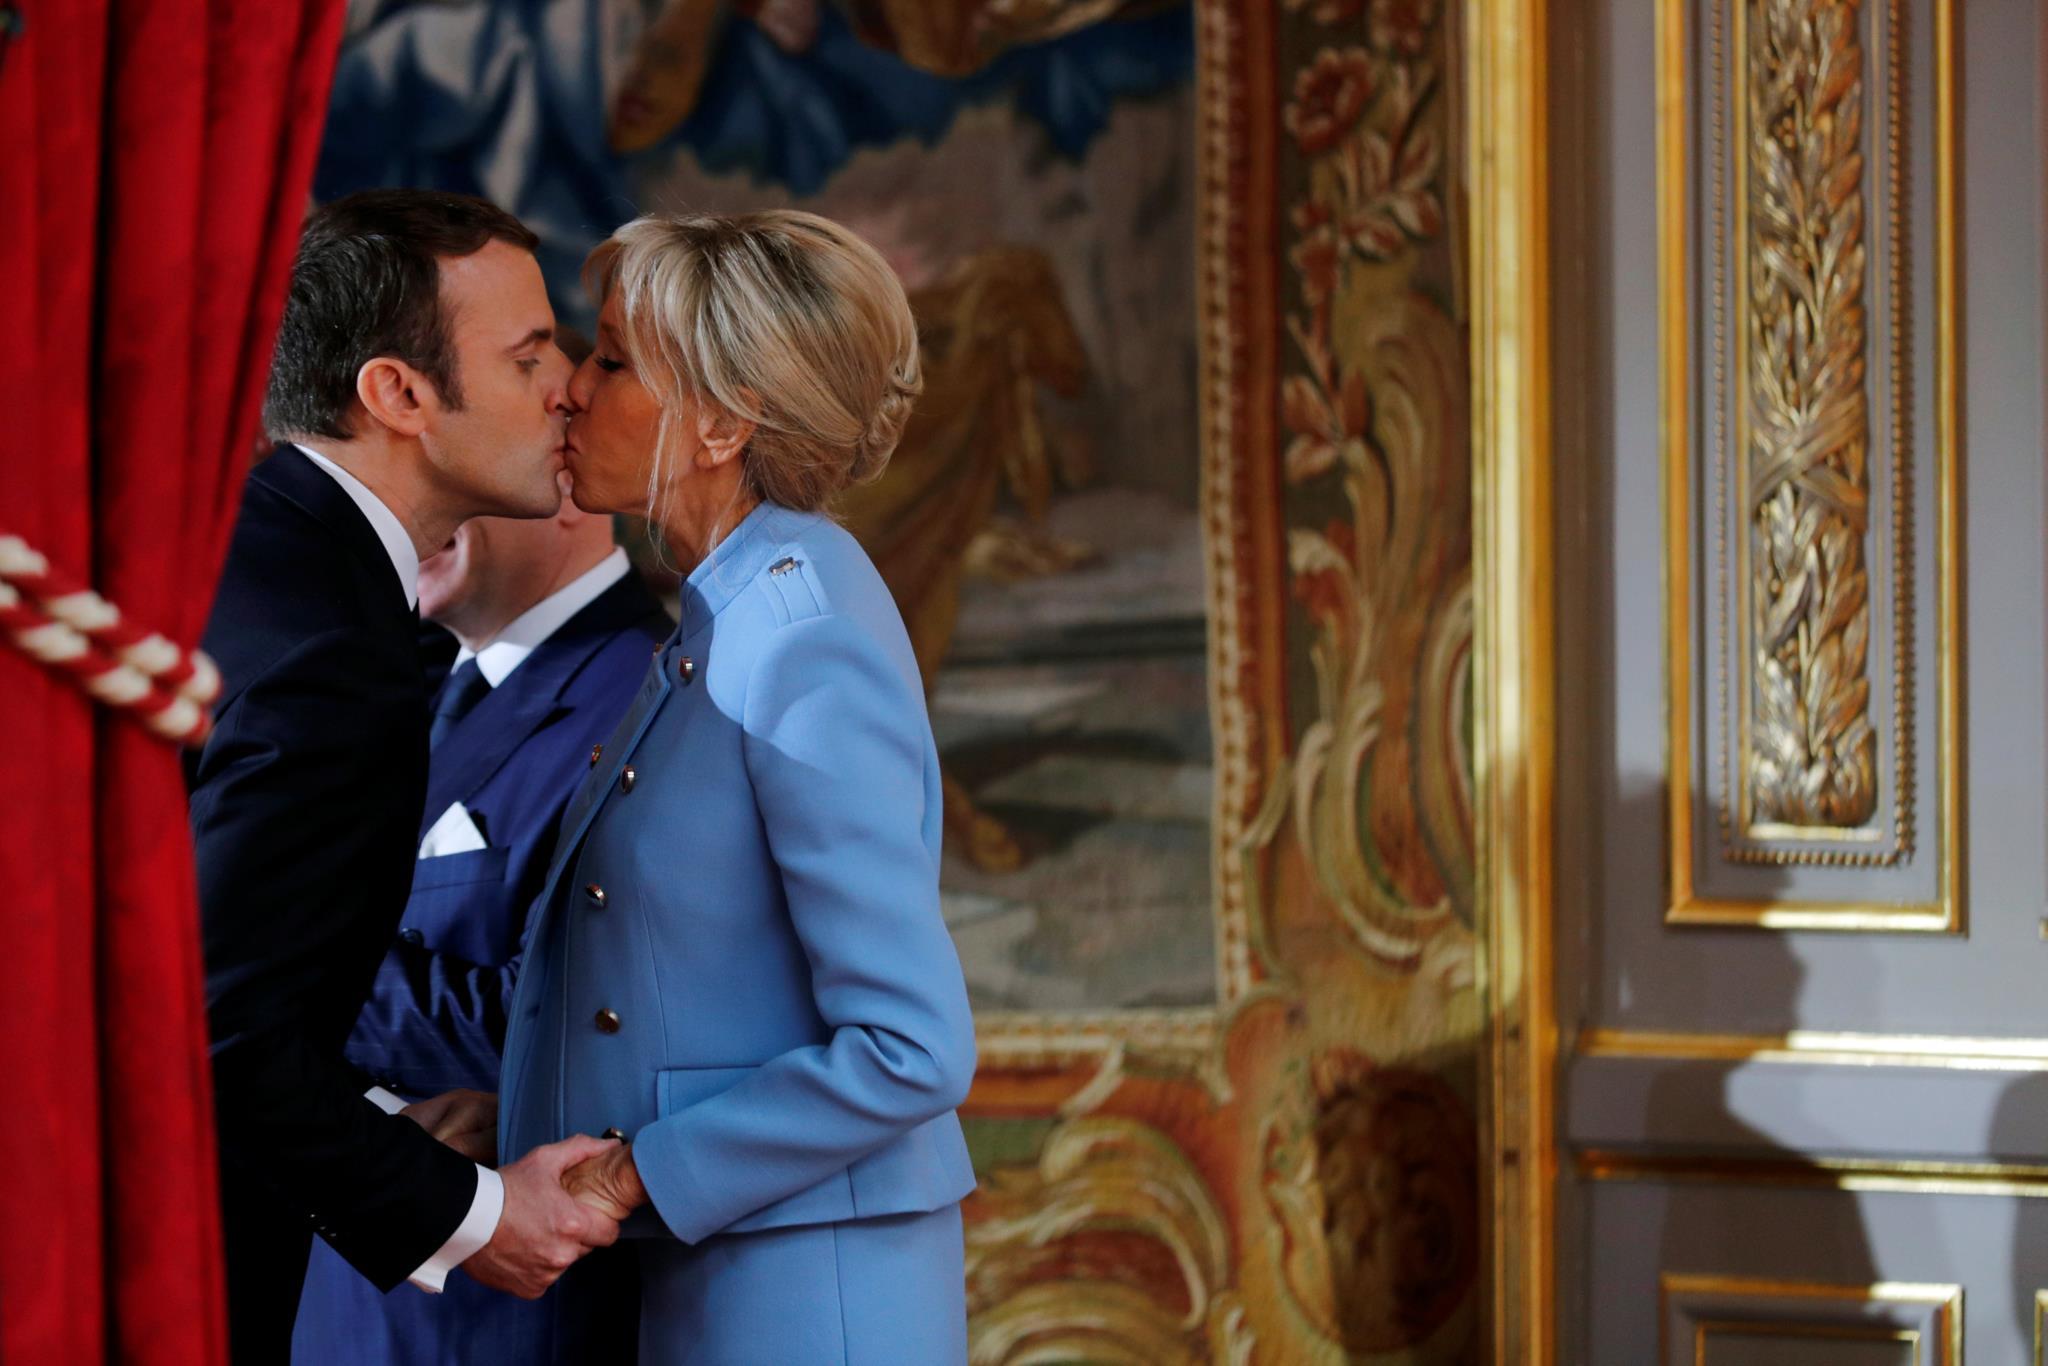 O Presidente Emmanuel Macron beija a mulher Brigitte Trogneux